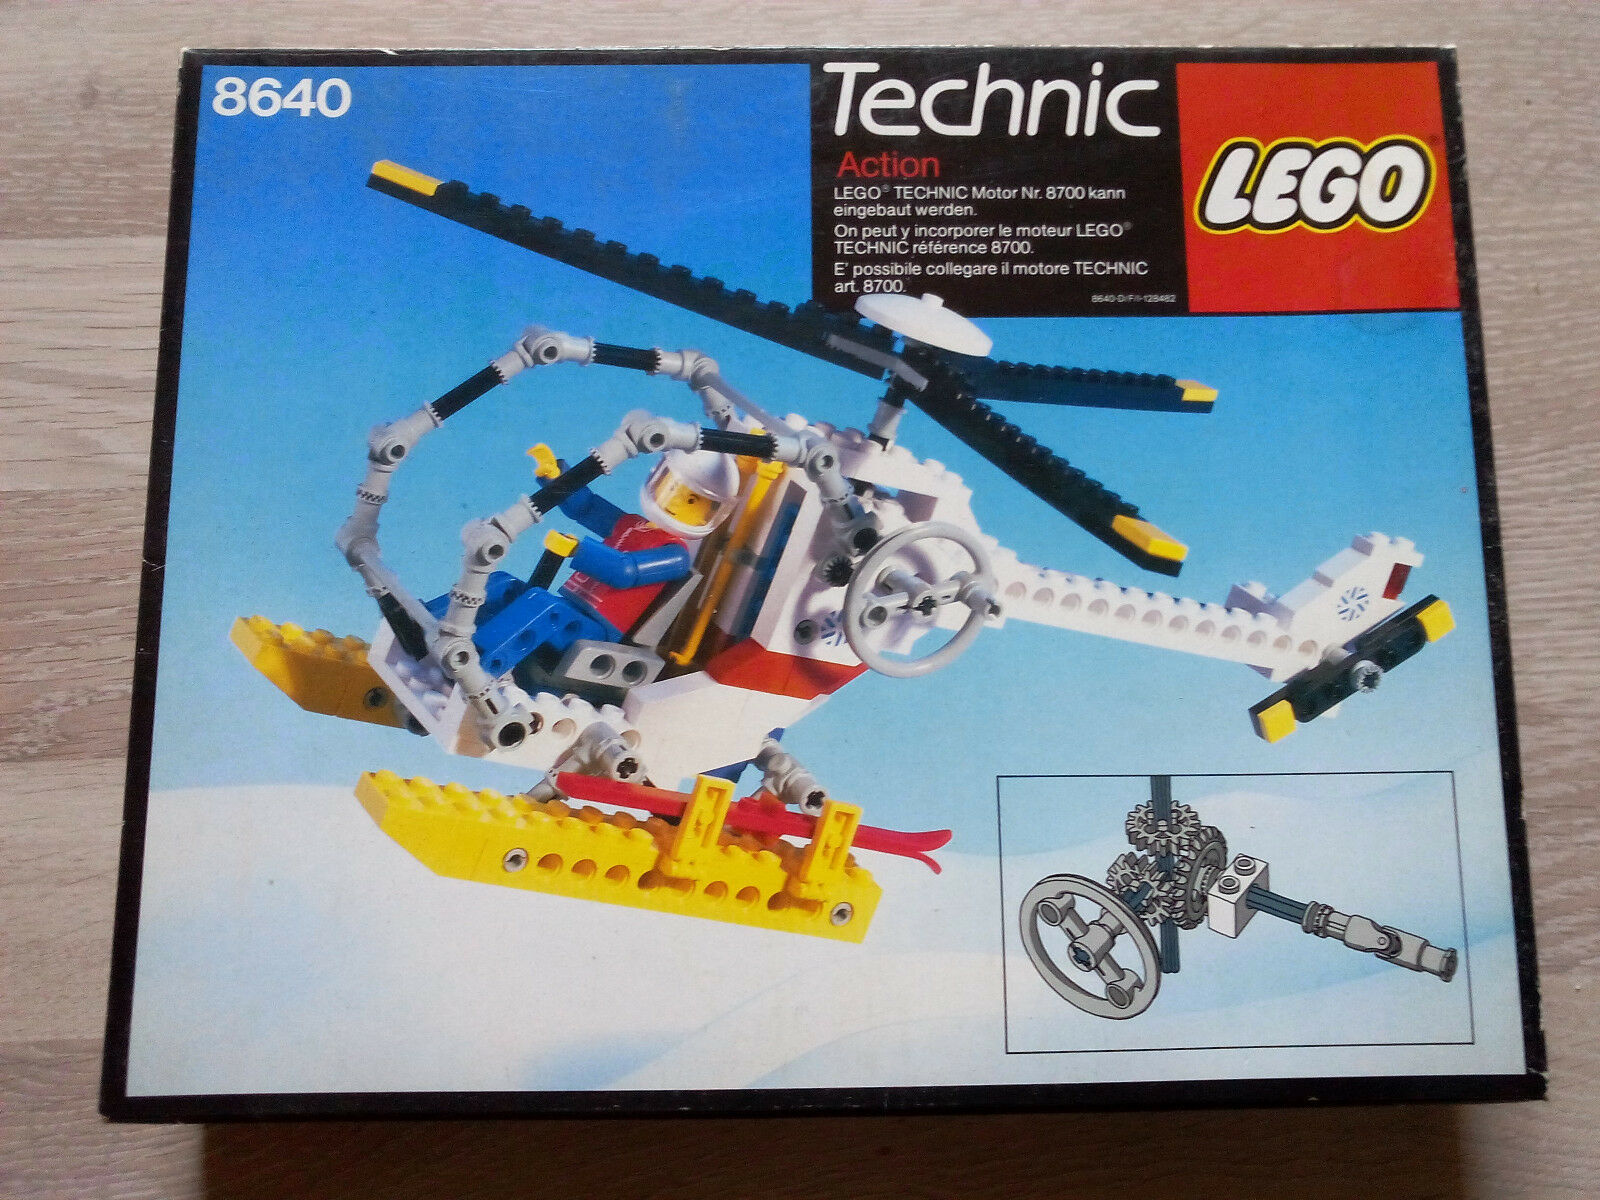 Lego Technic Technik 8640 Polar Helicopter   NEU & OVP - RARITÄT